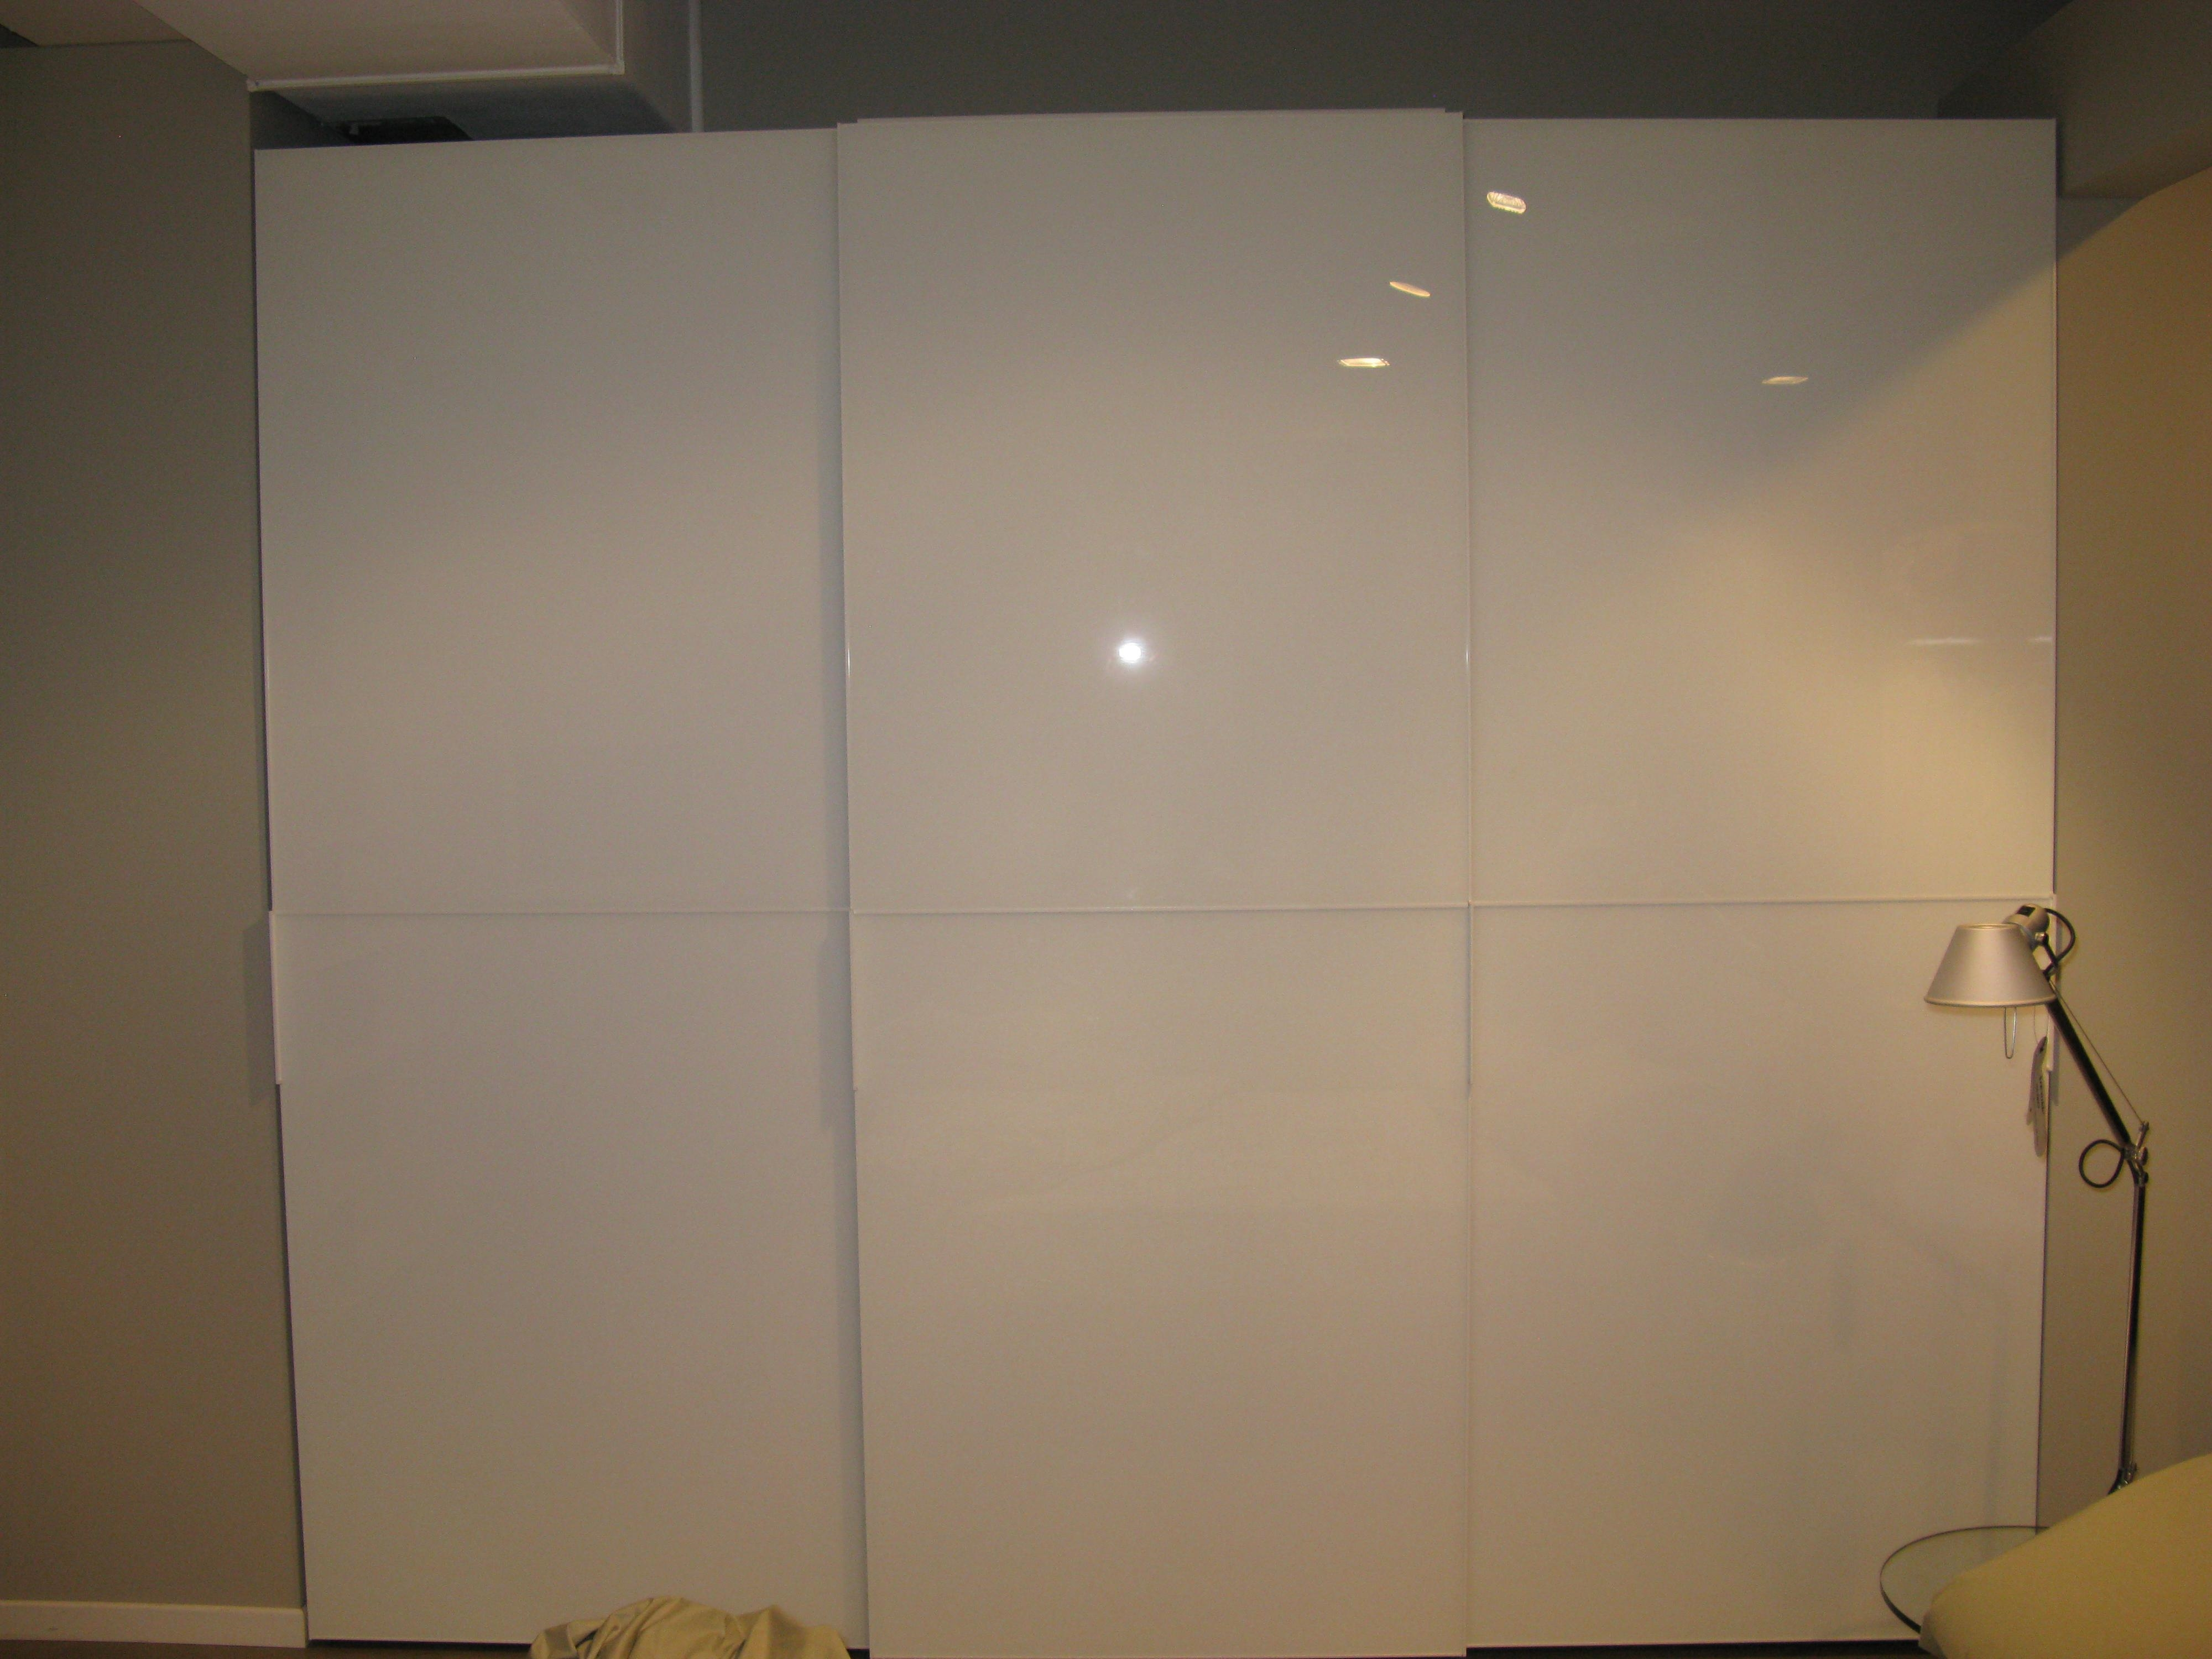 Armadio pensile ikea ikea armadi per il bagno casa immobiliare accessori ikea sanitari with - Ikea armadio scorrevole ...